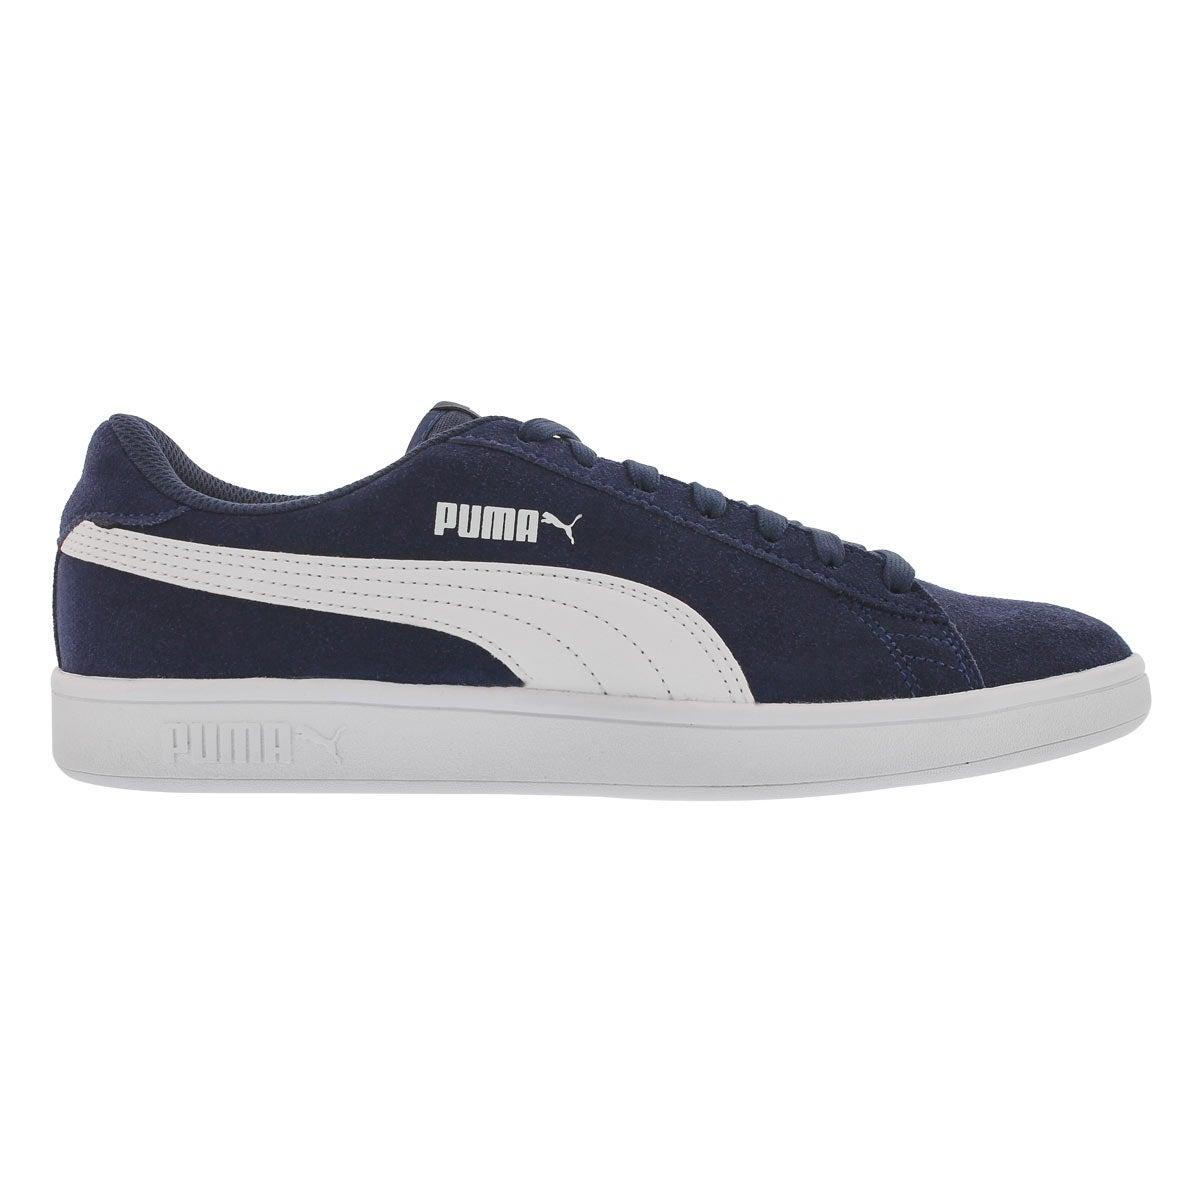 Mns Puma Smash v2 peacoat/wht sneaker